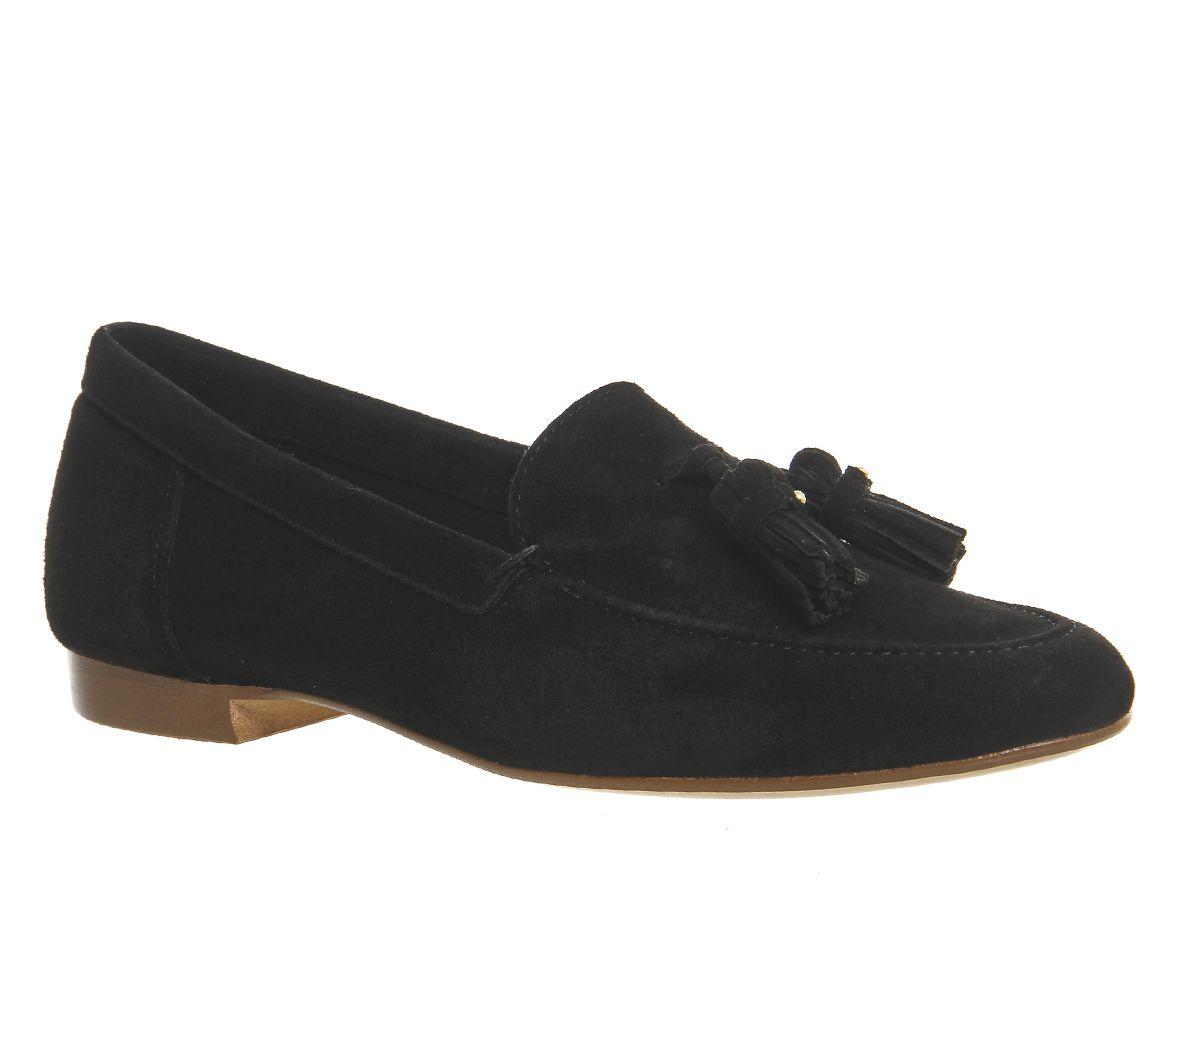 1af592a11b9 Office Retro Tassel Loafers Black Suede - Loafers